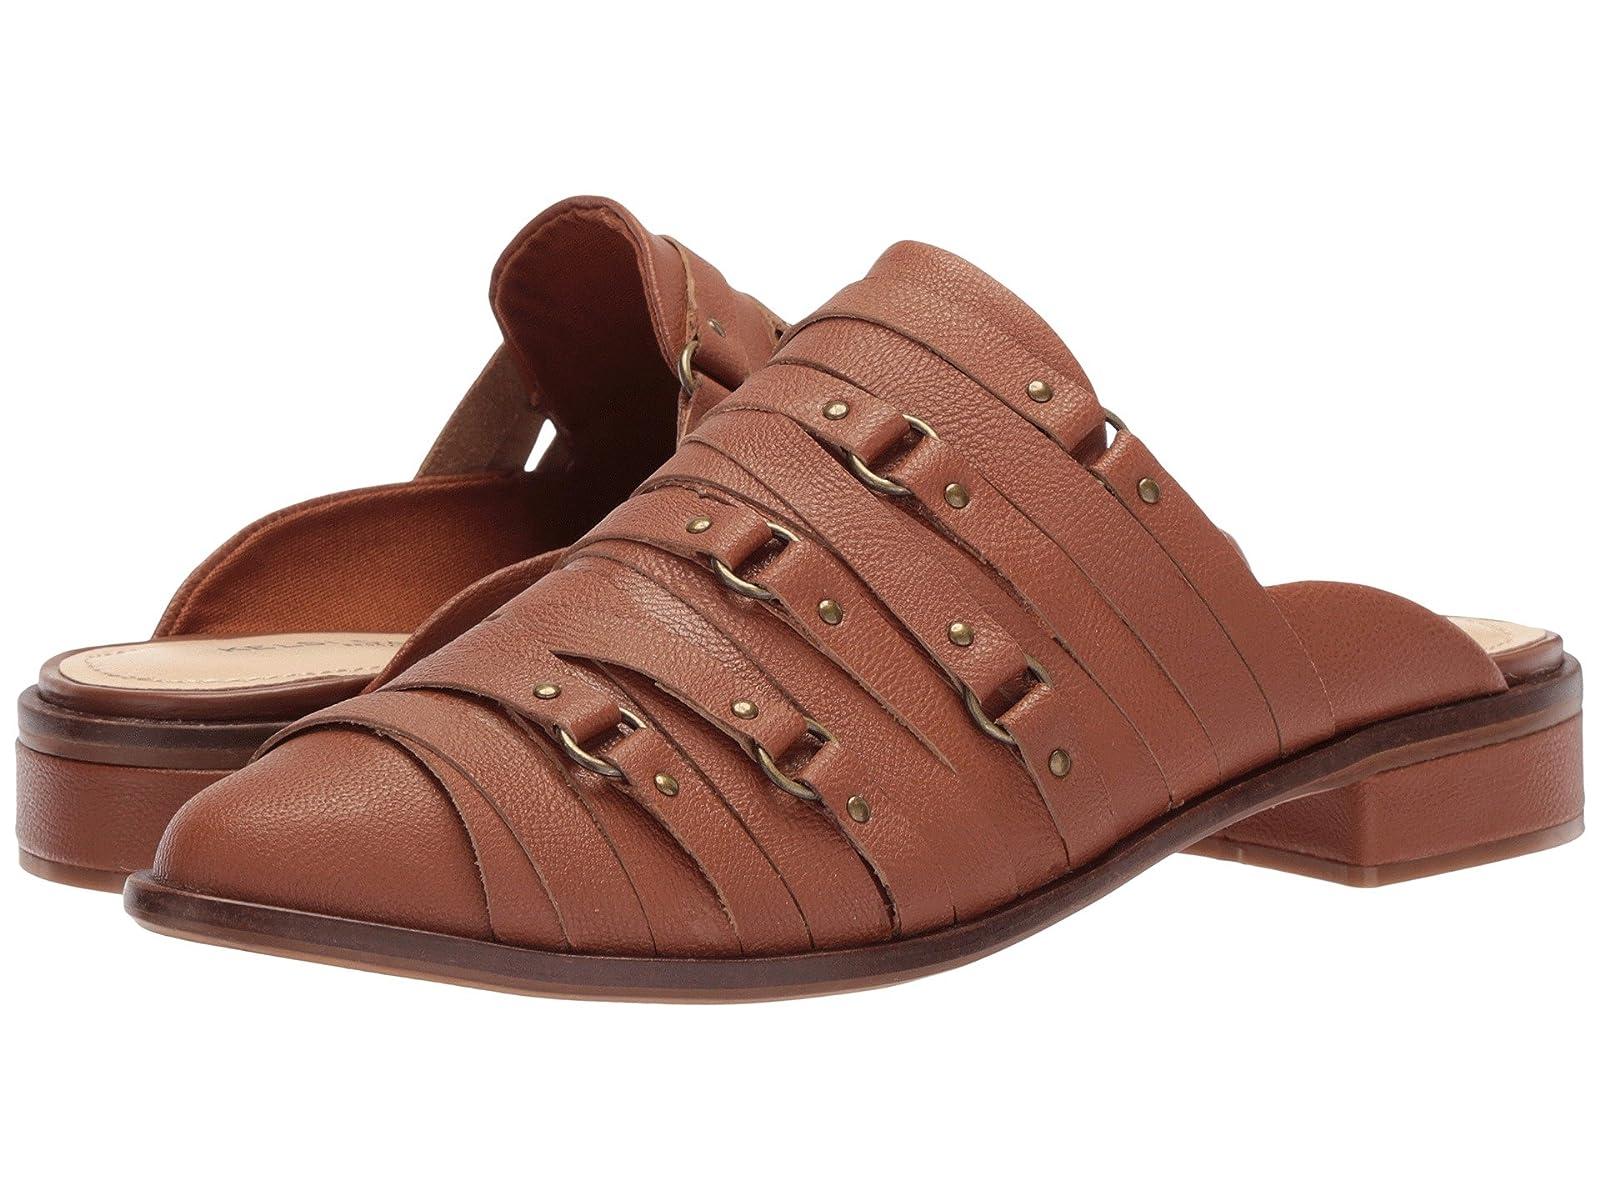 Kelsi Dagger Brooklyn Alchemy SlideCheap and distinctive eye-catching shoes